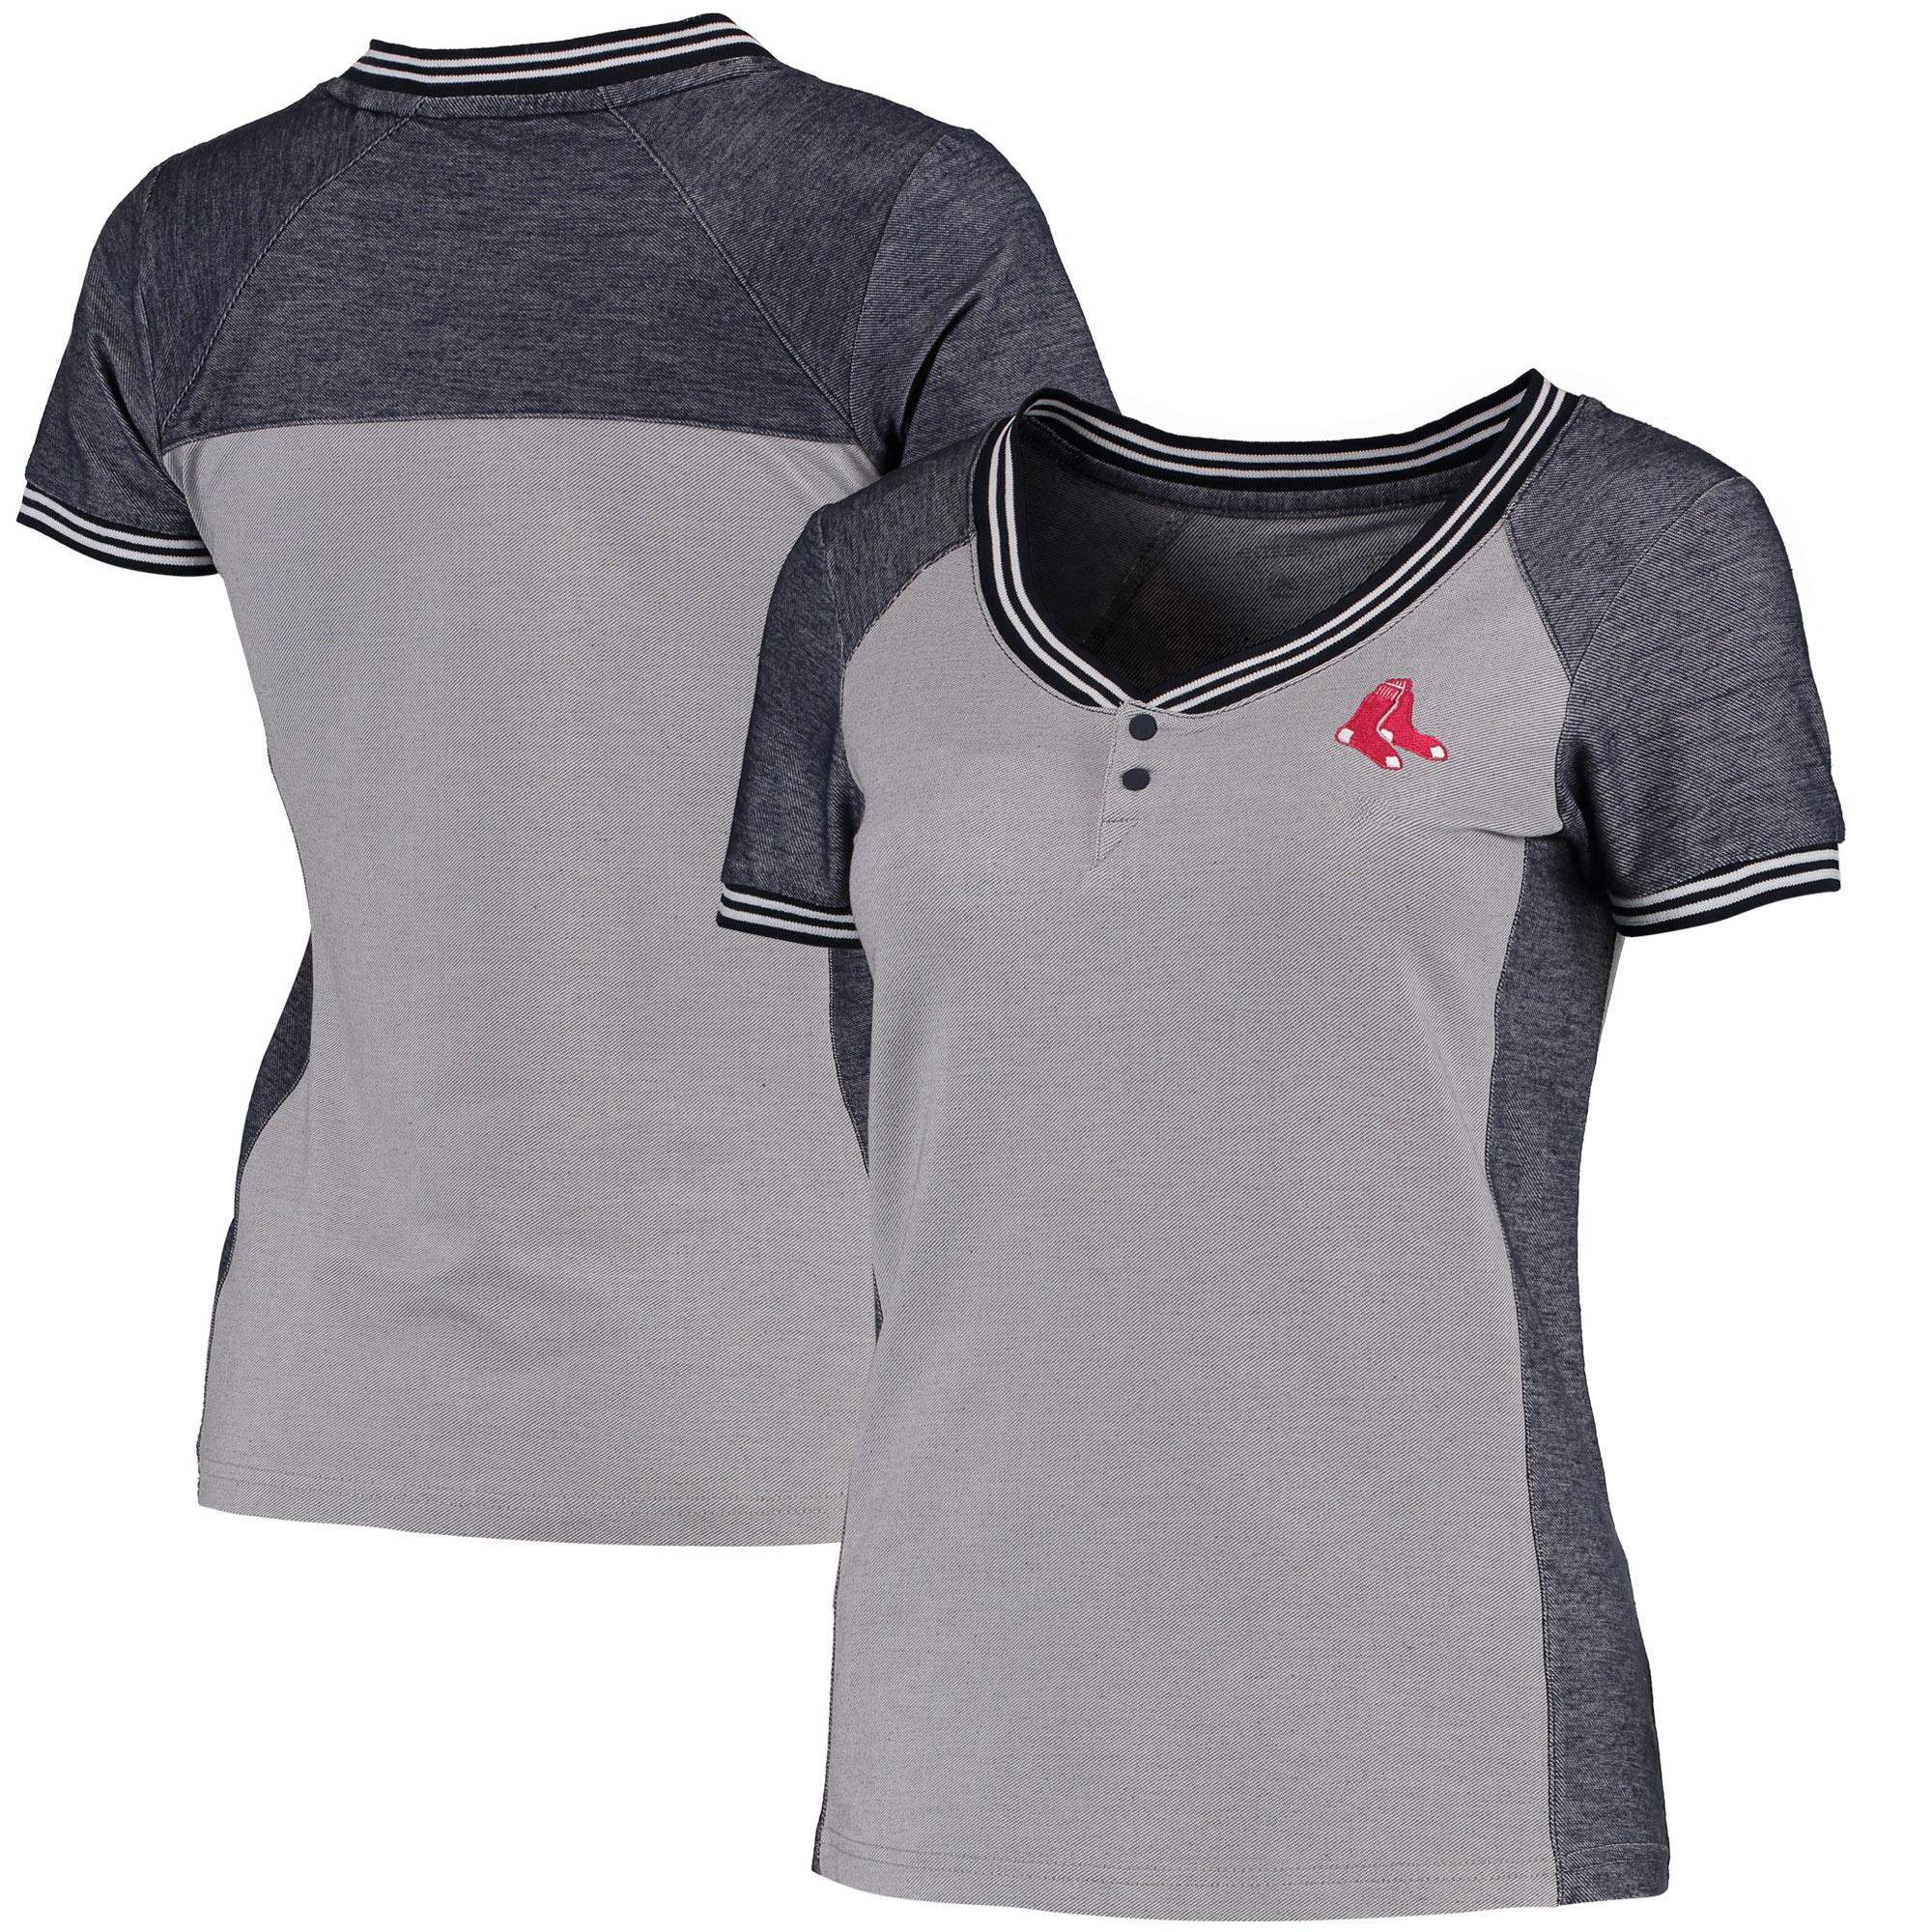 Boston Red Sox Antigua Women's Quick Henley T-Shirt - Gray/Navy